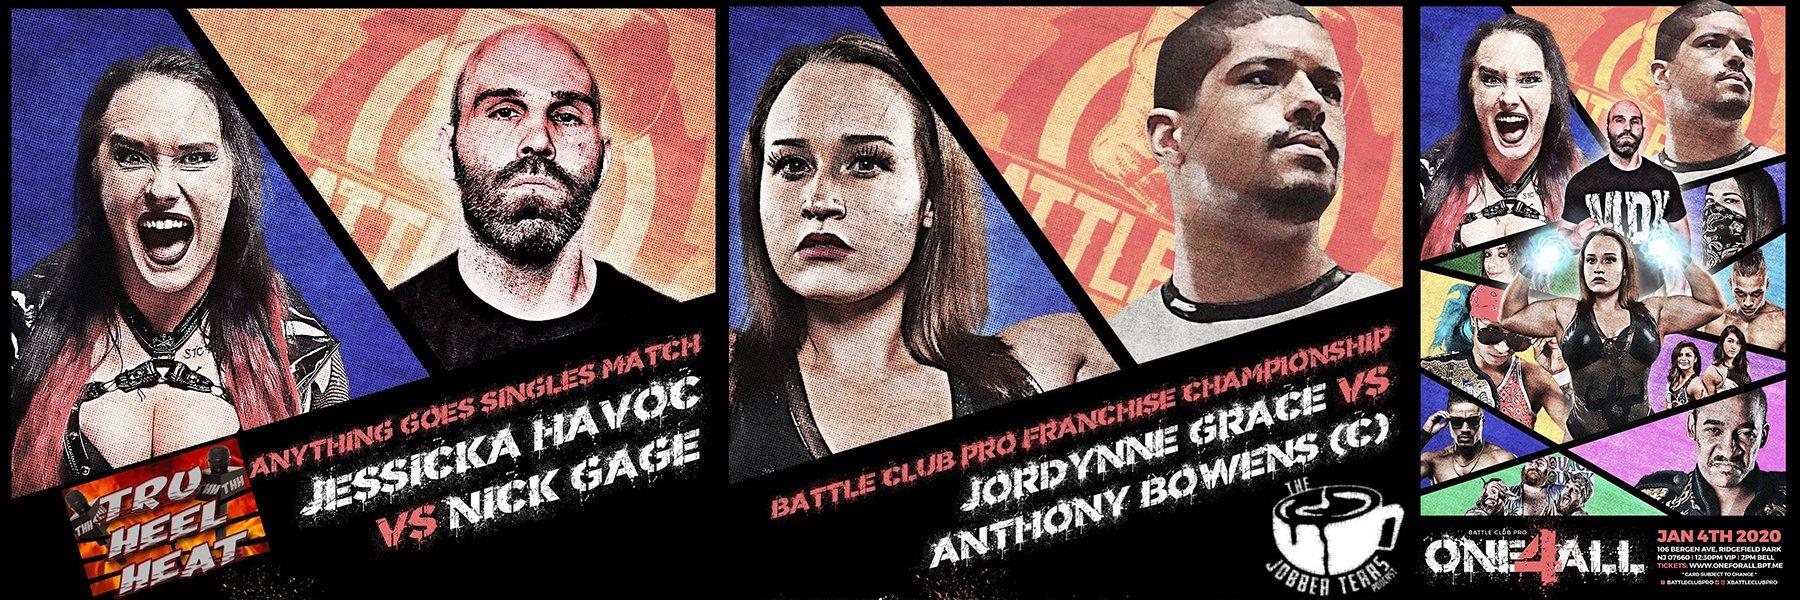 "Just Added! Battle Club Pro ""One 4 All"" - Jordynne Grace vs Anthony Bowens"